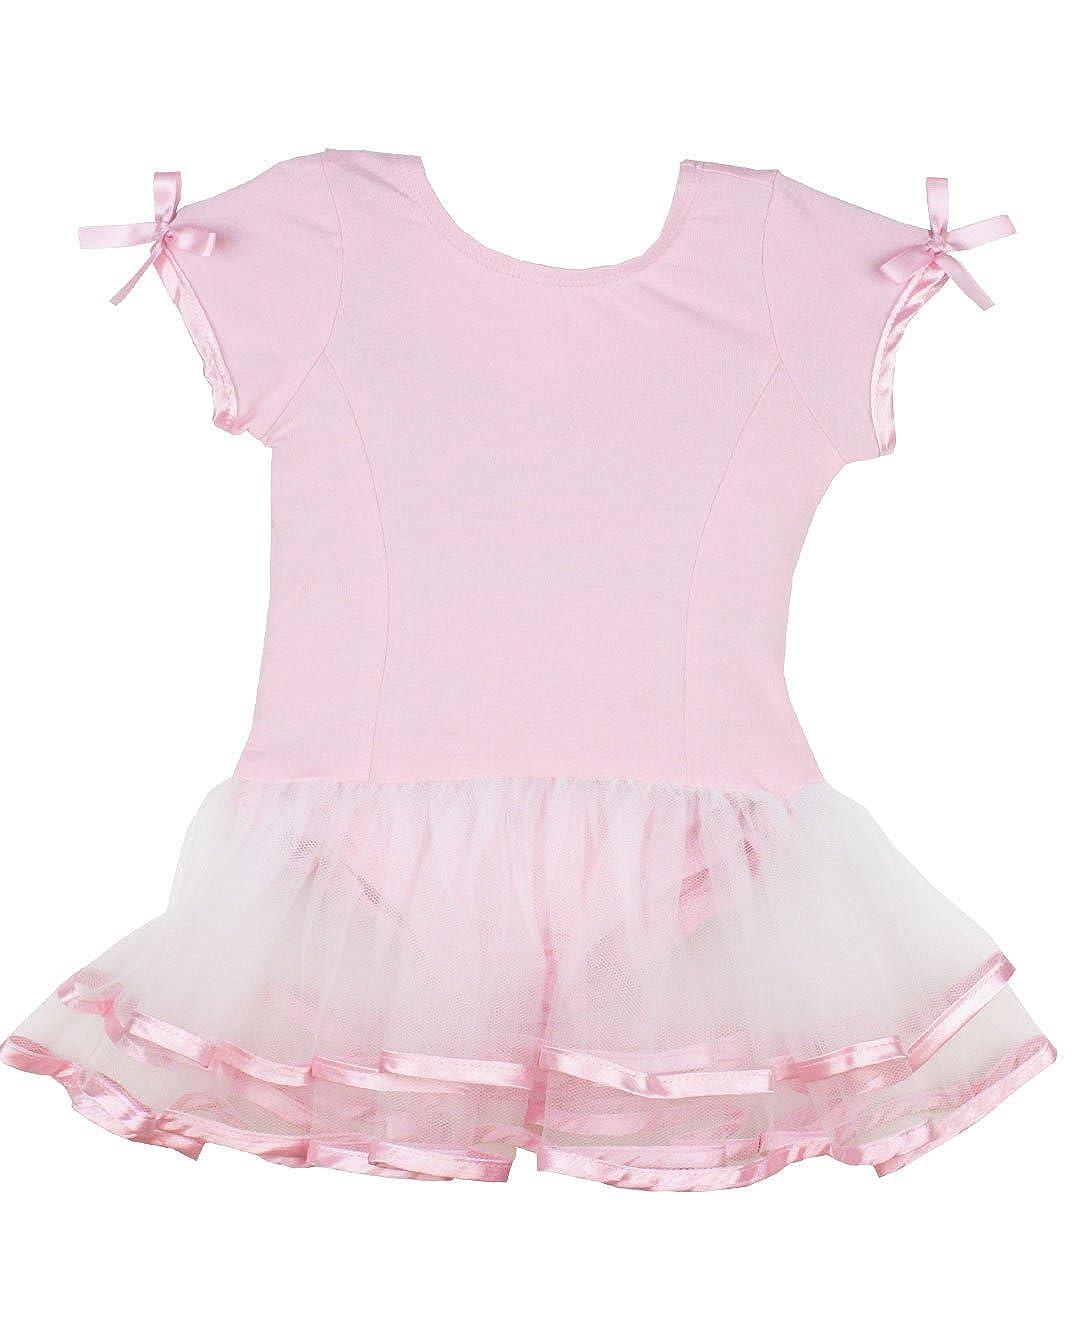 RuffleButts DRESS ベビーガールズ B009DKDB6I ピンク/ホワイト 12-24 Months